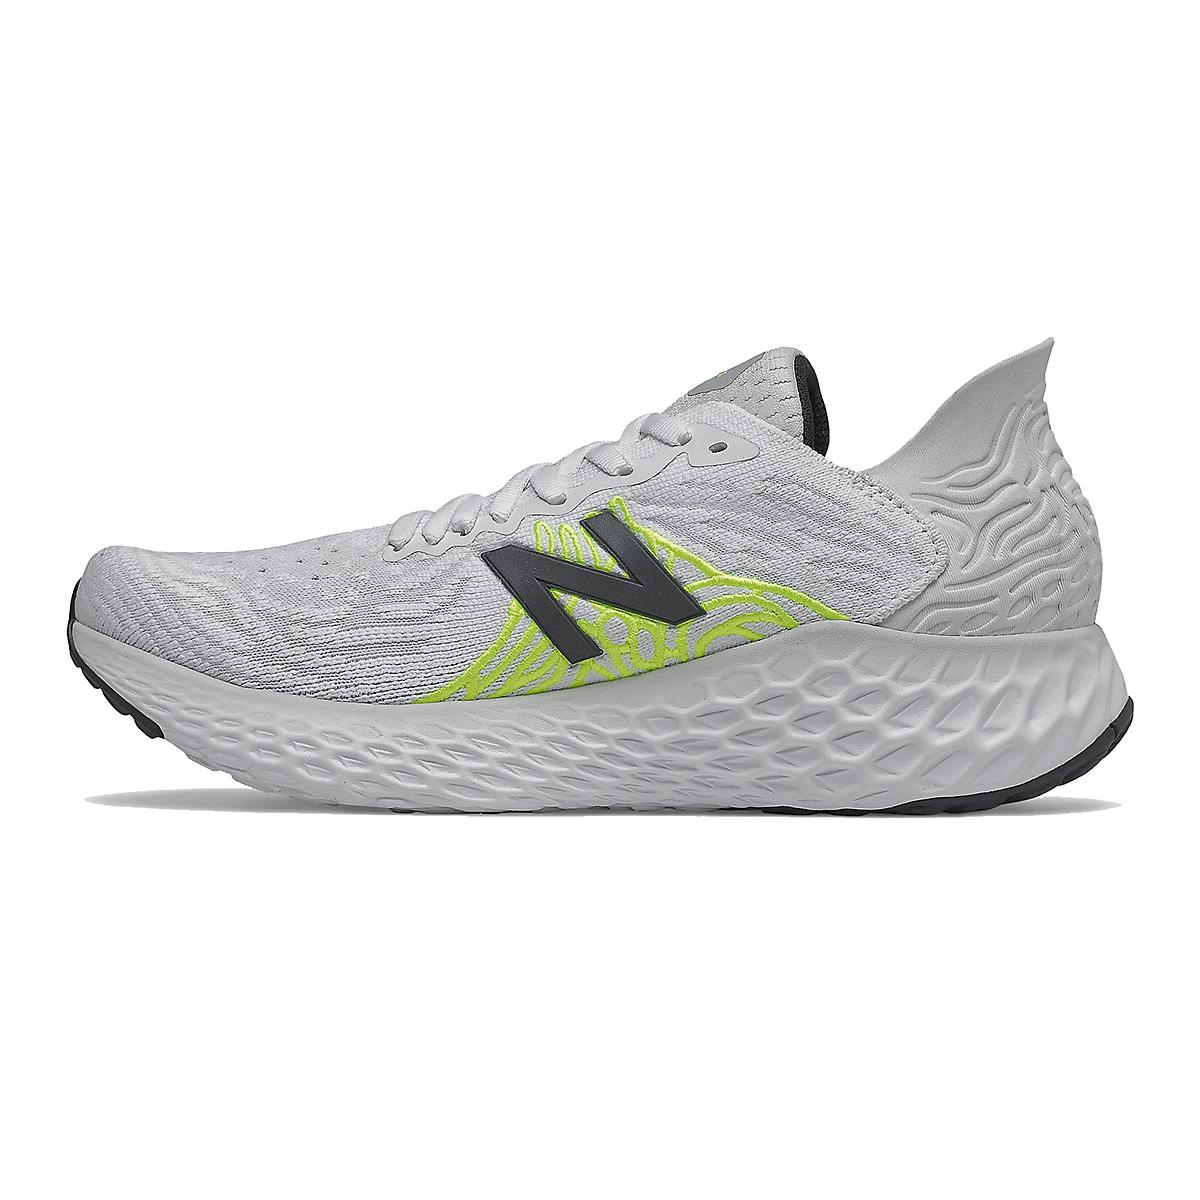 Women's New Balance Fresh Foam 1080v10 Running Shoe - Color: Light Aluminum - Size: 5.5 - Width: Extra Wide, Light Aluminum, large, image 2